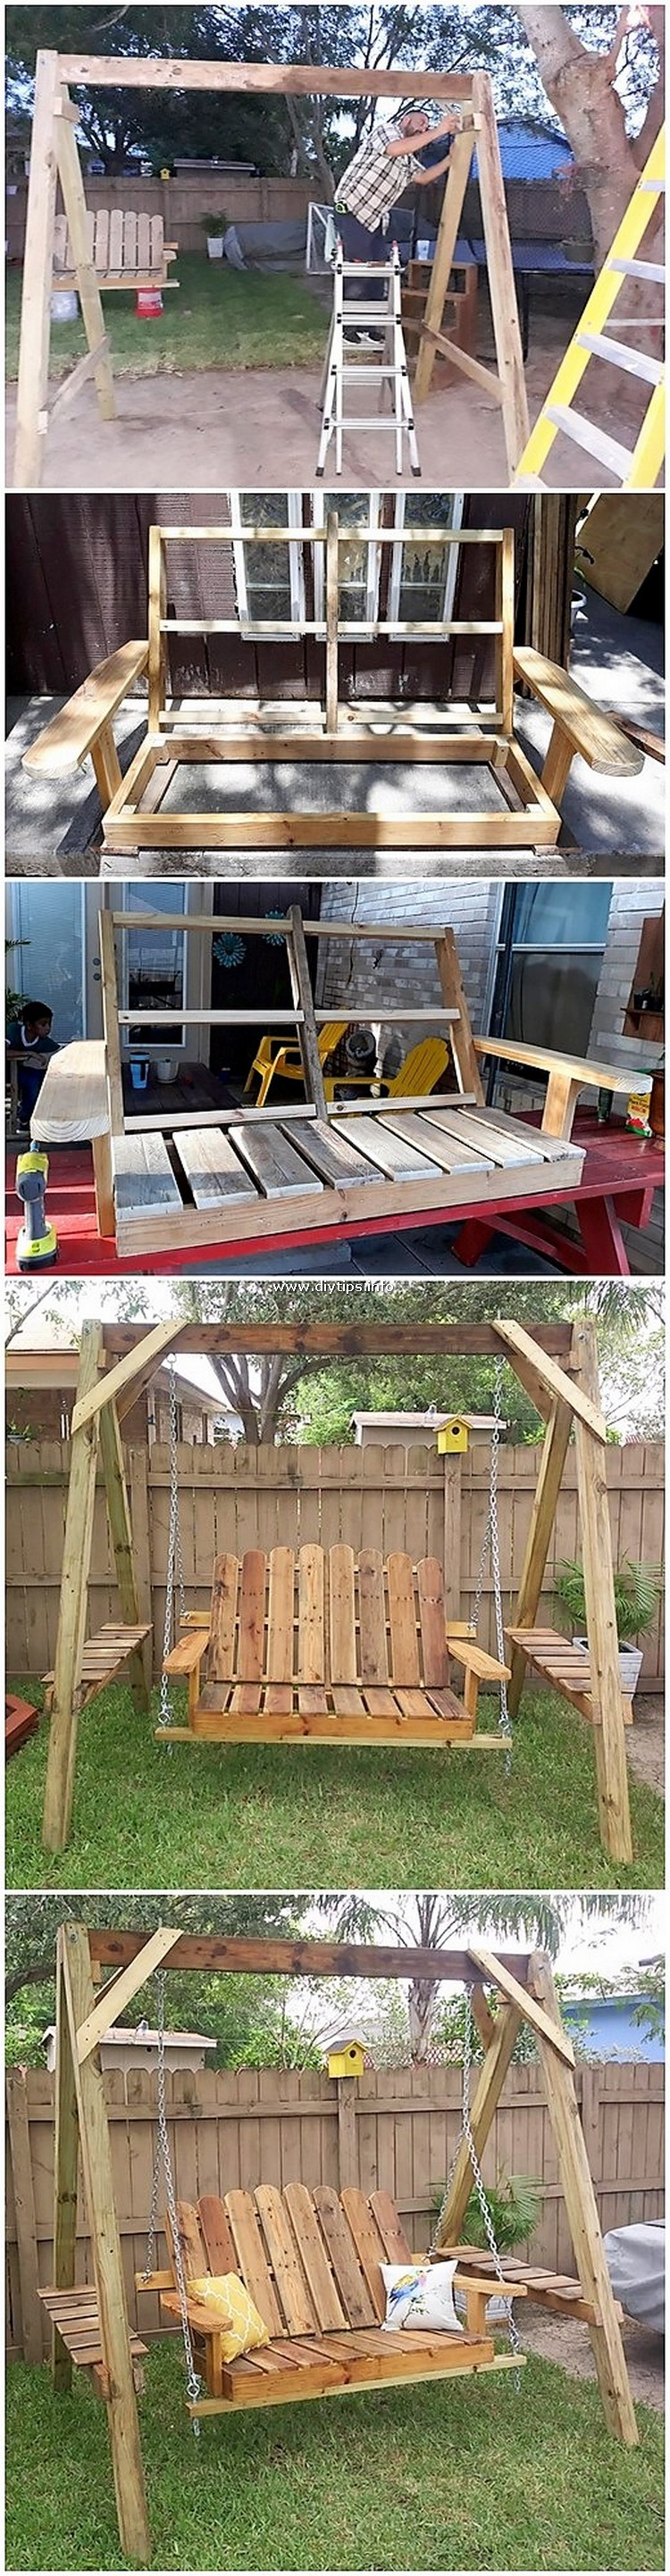 DIY Pallet Swing Bench